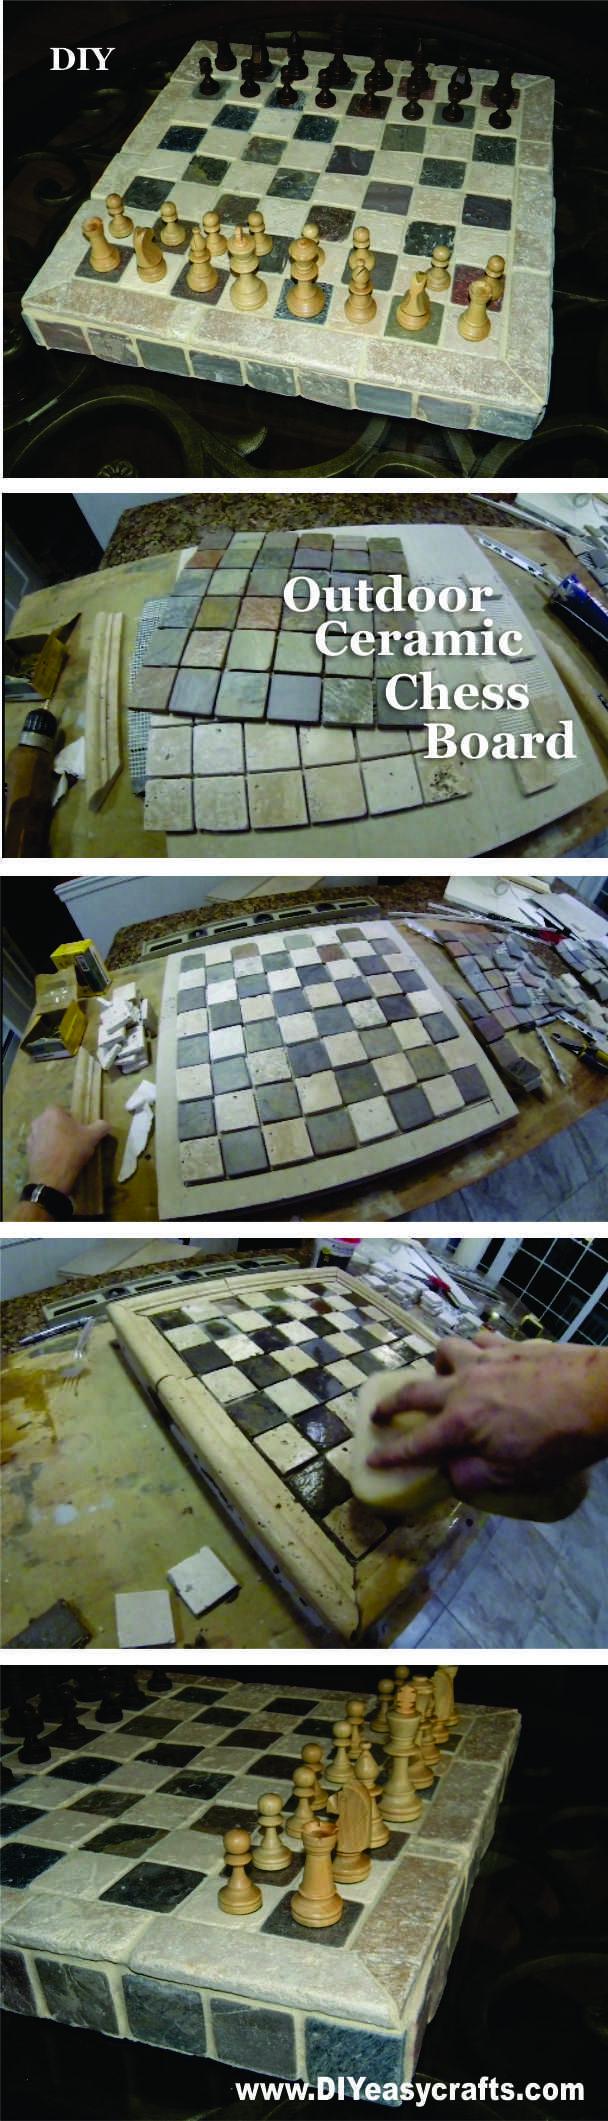 DIY Ceramic Tile Outdoor Chess Board. www.DIYeasycrafts.com ...